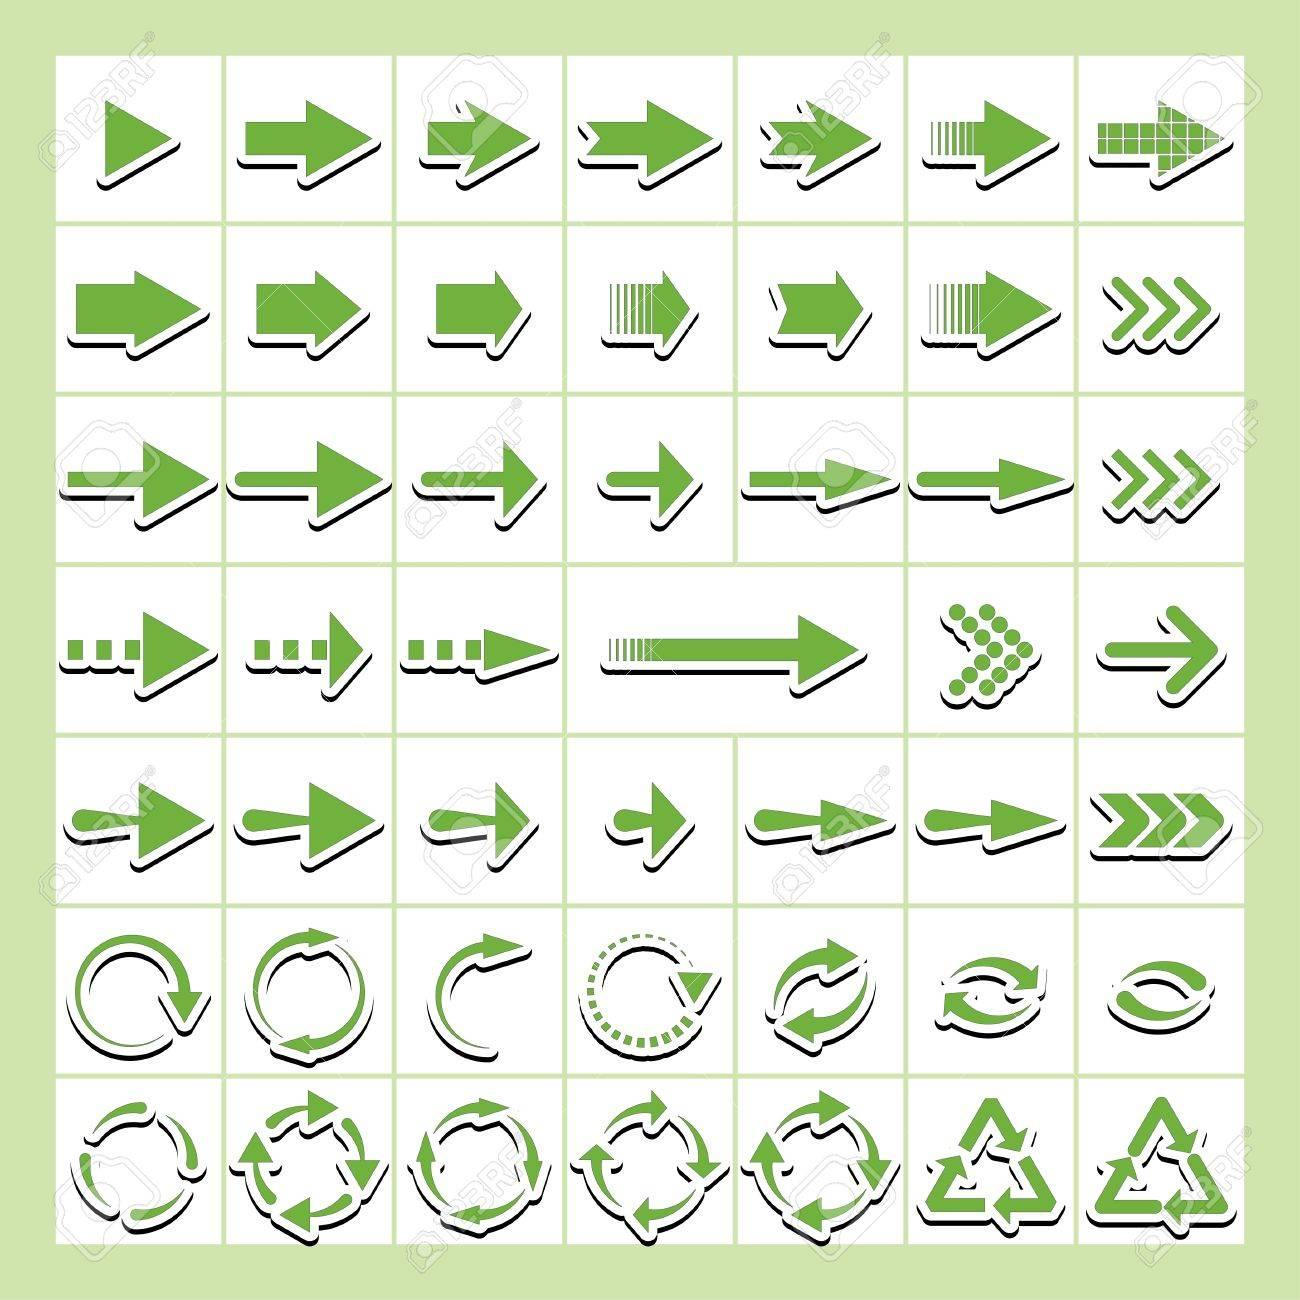 green arrows-stickers. Stock Vector - 19658060